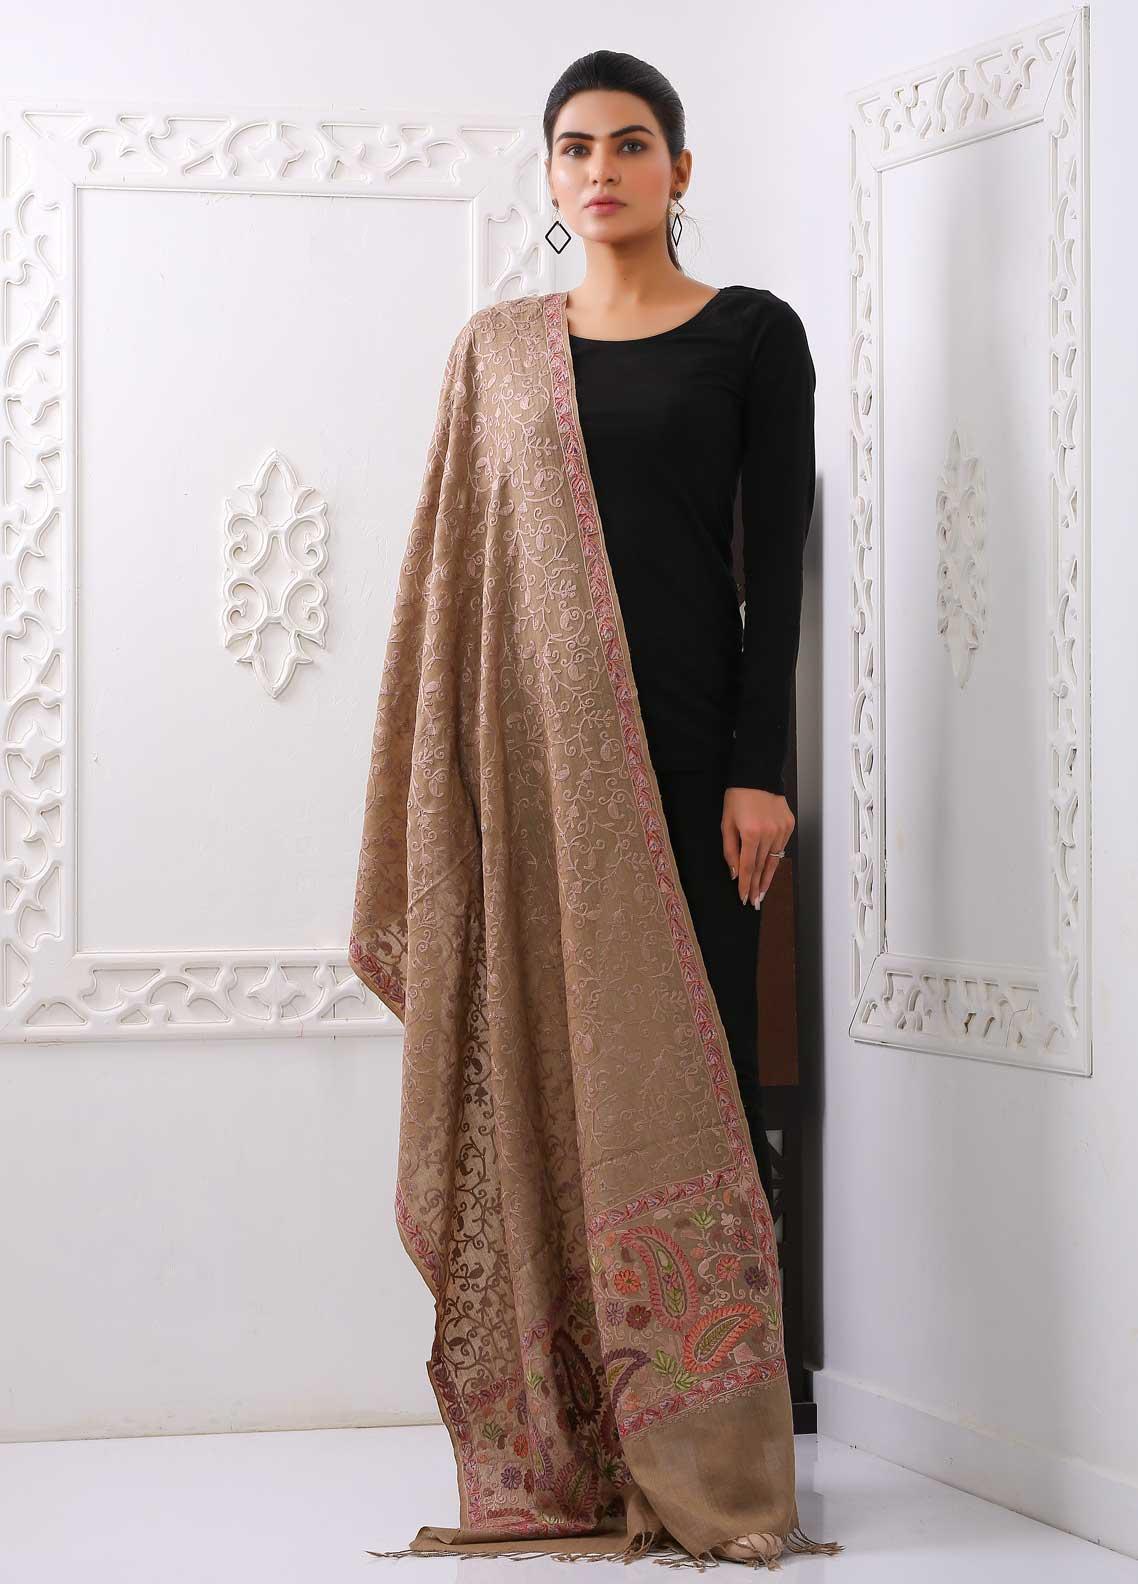 Sanaulla Exclusive Range Embroidered Pashmina  Stole PSTL 323535  Pashmina Stoles